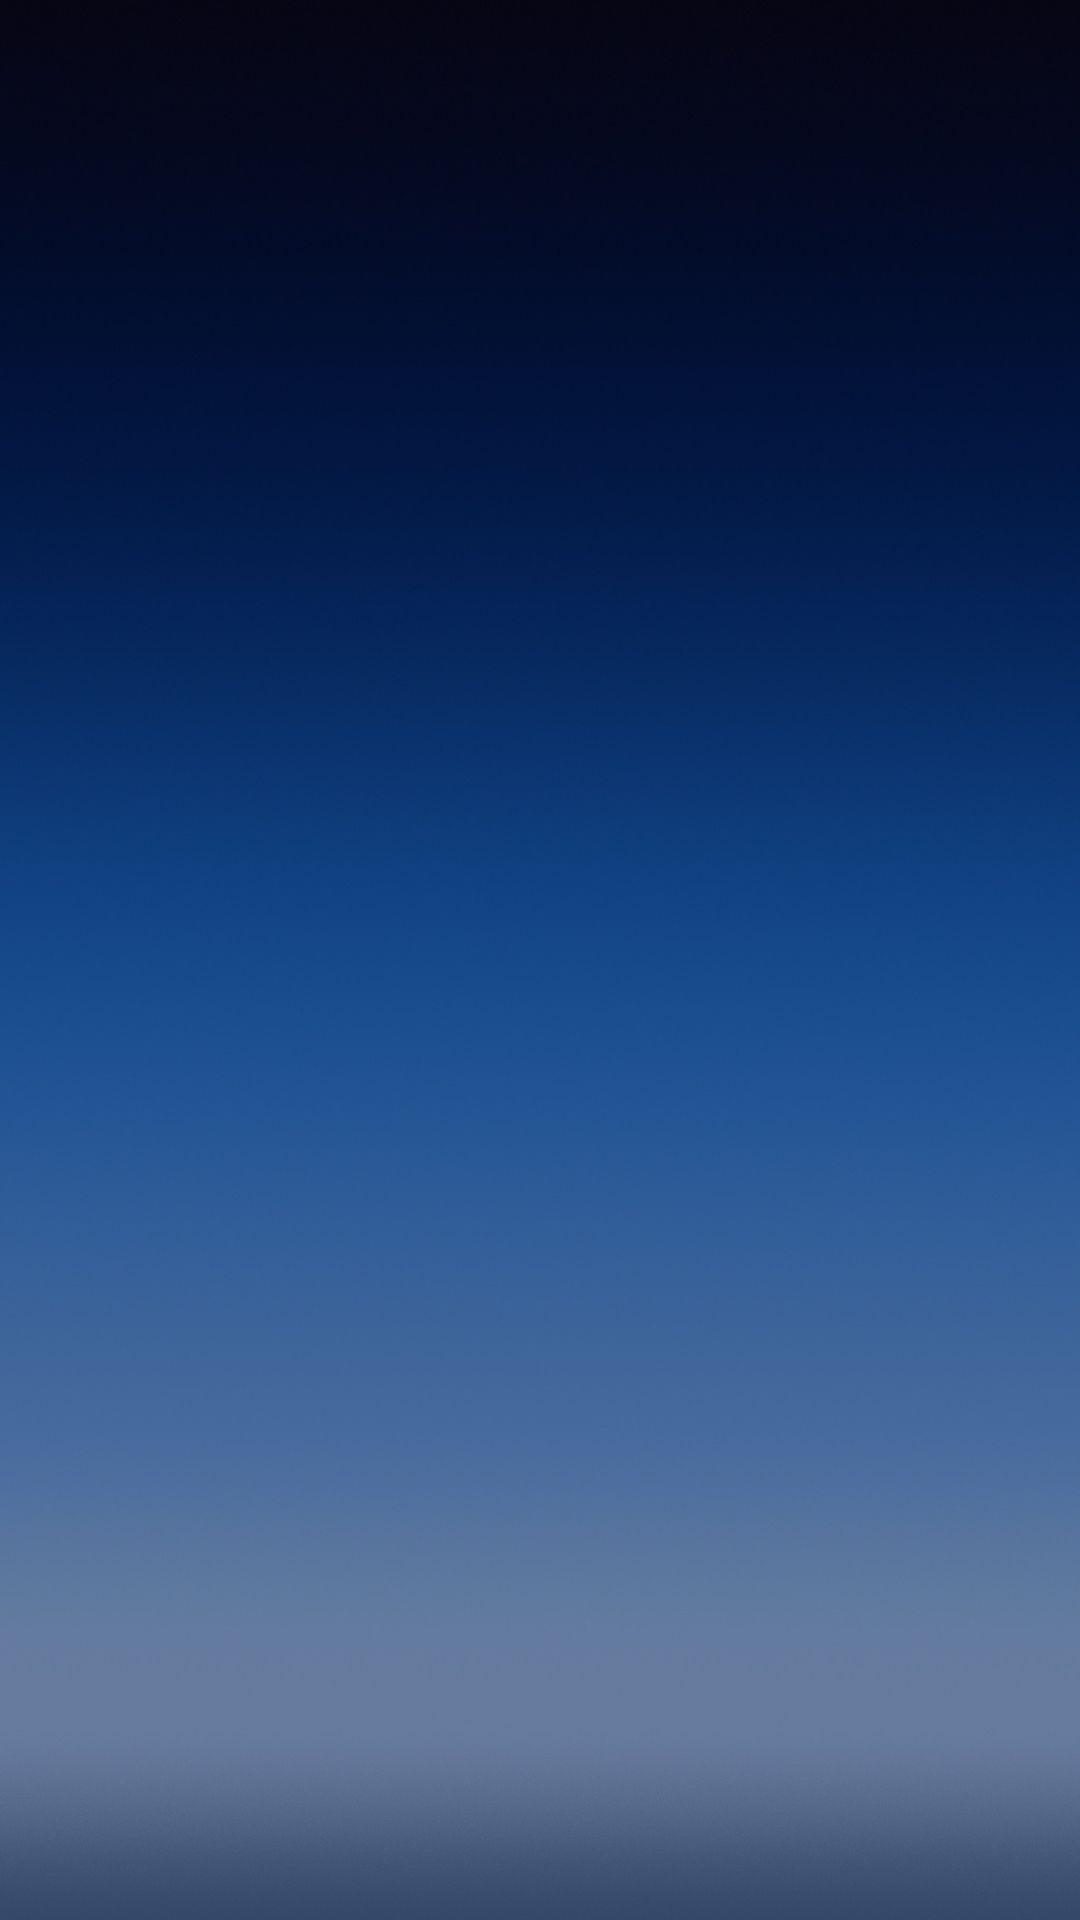 blue, wallpaper, galaxy, clean, beauty, colour, peaceful, calming